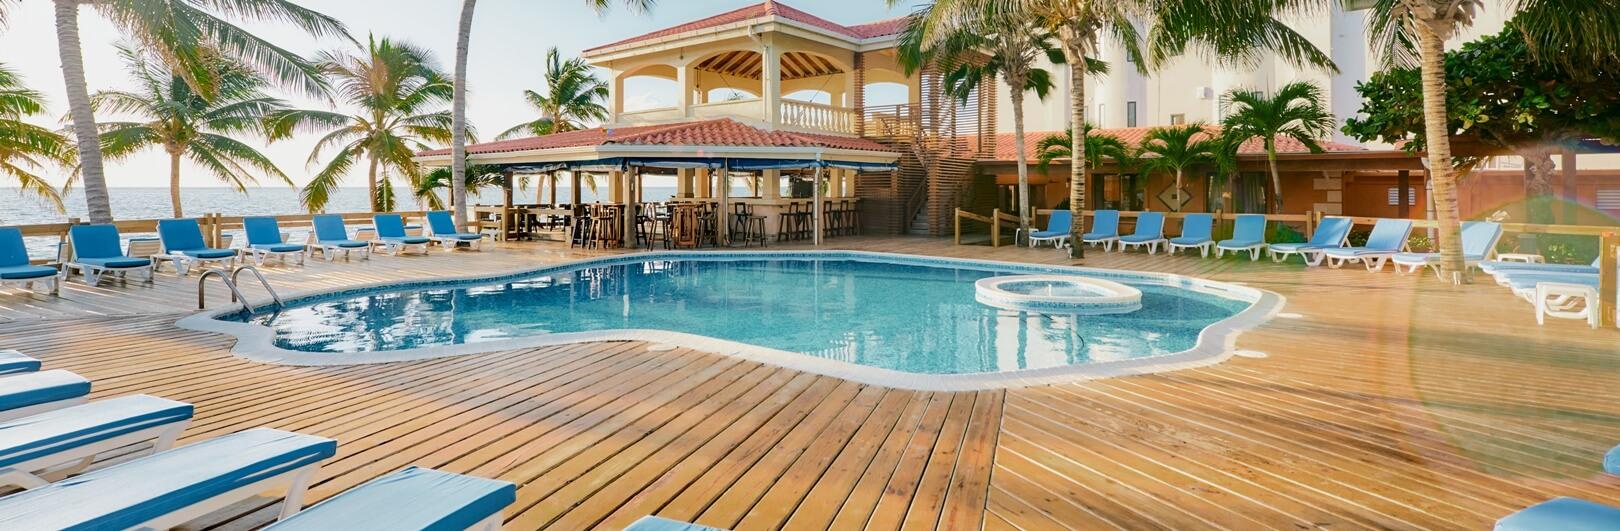 Sunbreeze Pool